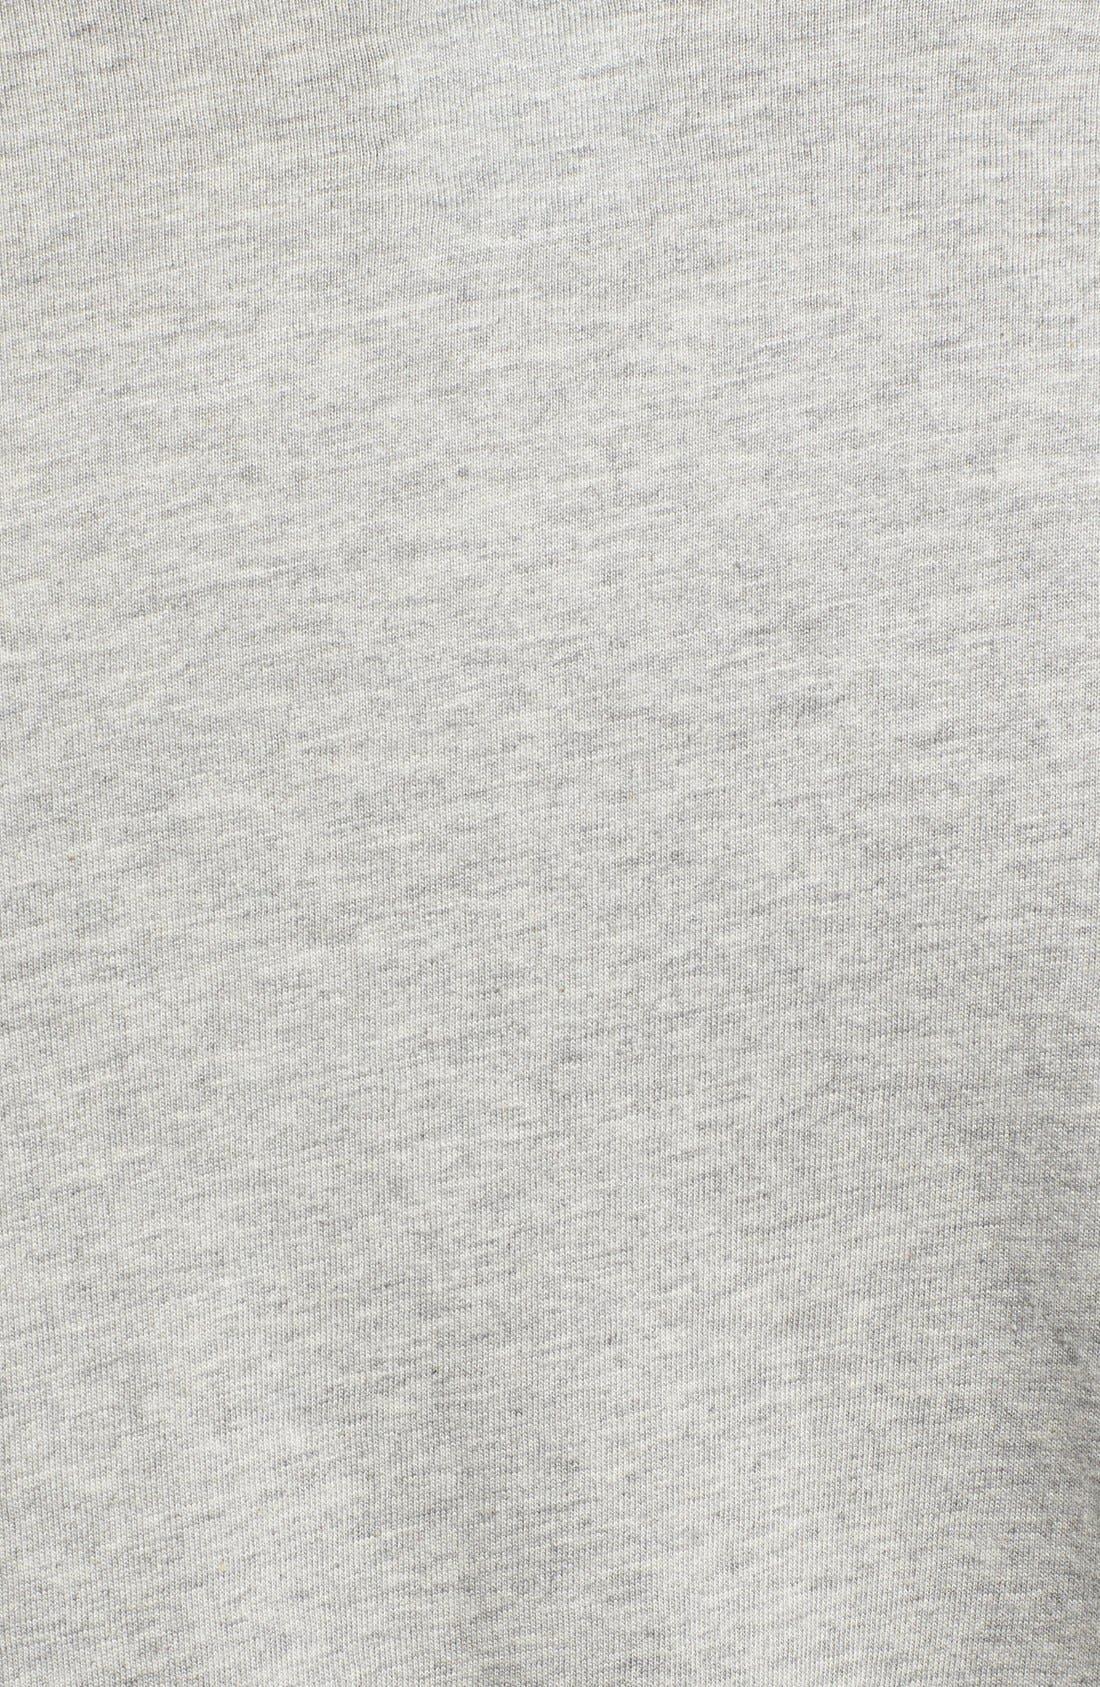 Crewneck T-Shirt,                             Alternate thumbnail 3, color,                             ANDOVER HEATHER